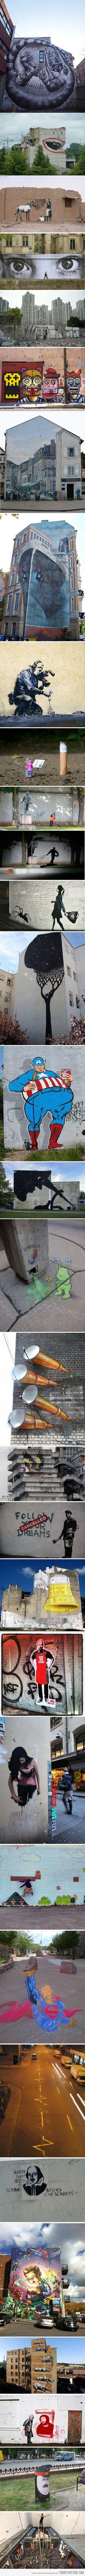 Arte de rua- graffite/ Street art- graffite